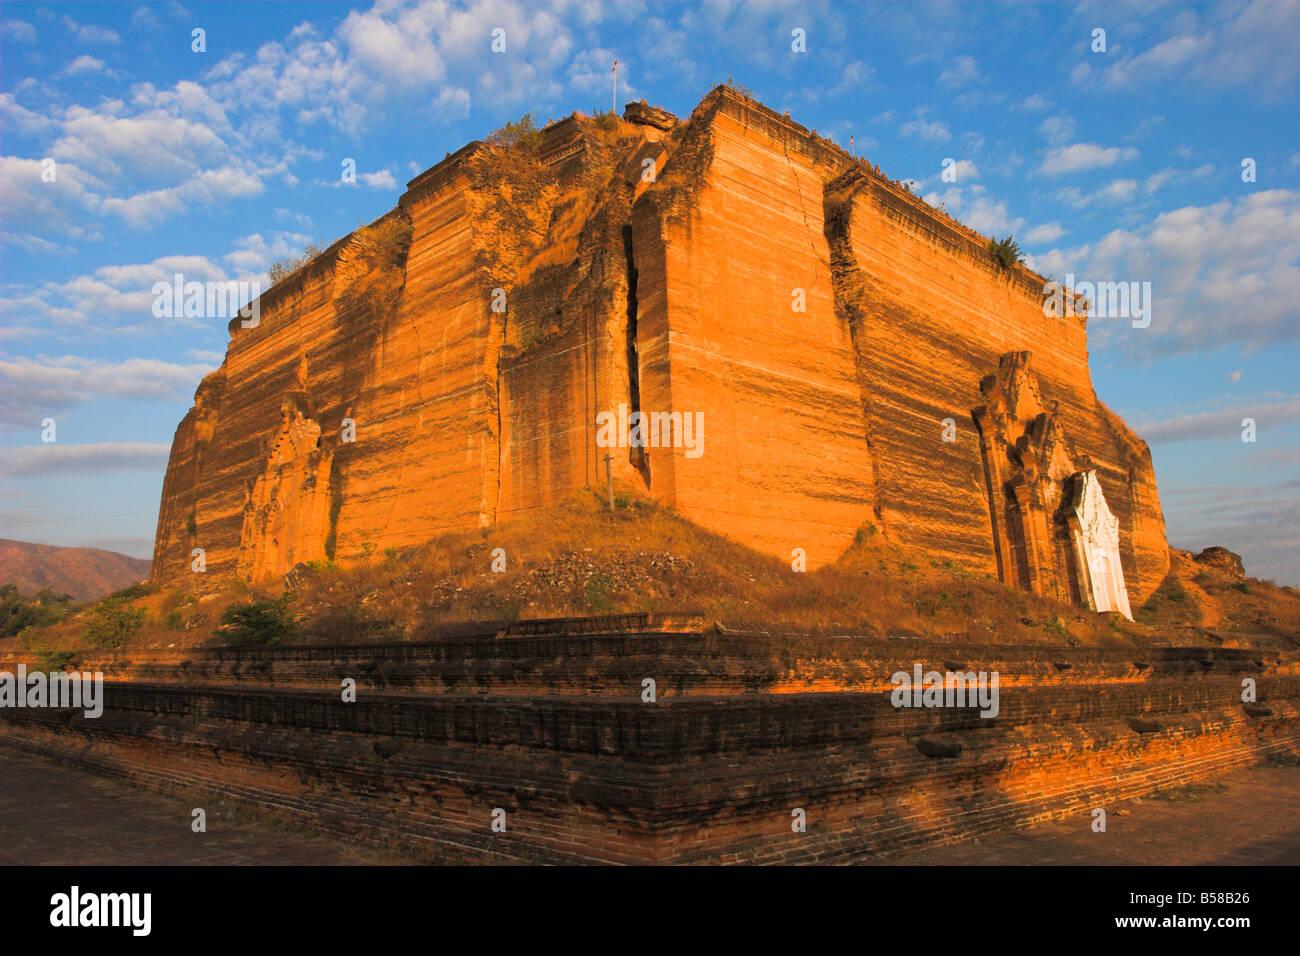 Mingun Paya badly cracked by earthquakes standing 50m high Mingun Paya Mingun Mandalay Myanmar Burma Asia - Stock Image